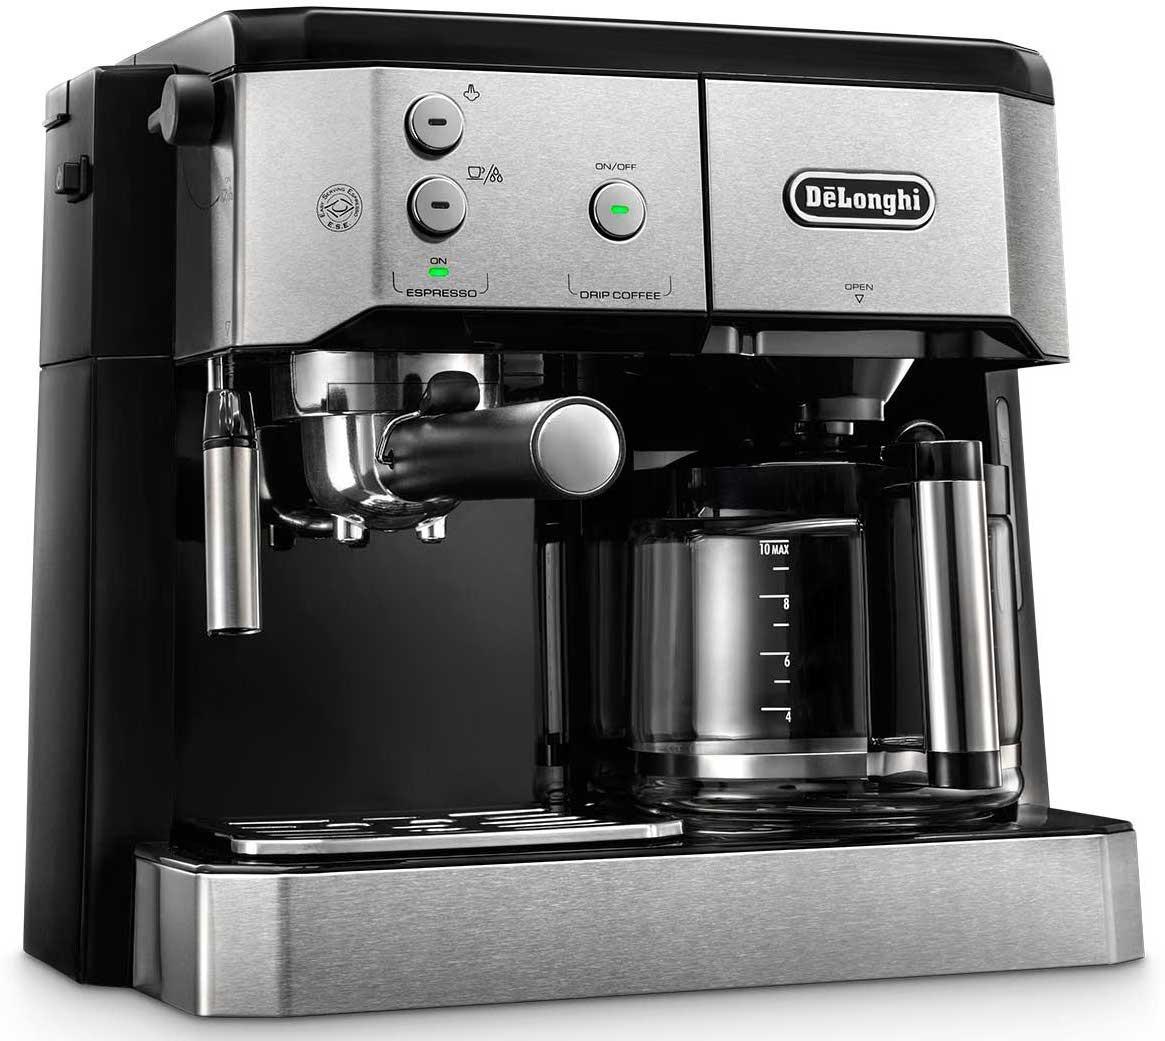 1847d2e890a6 DeLonghi BCO421.S dual function coffee machine (espresso and drip ...